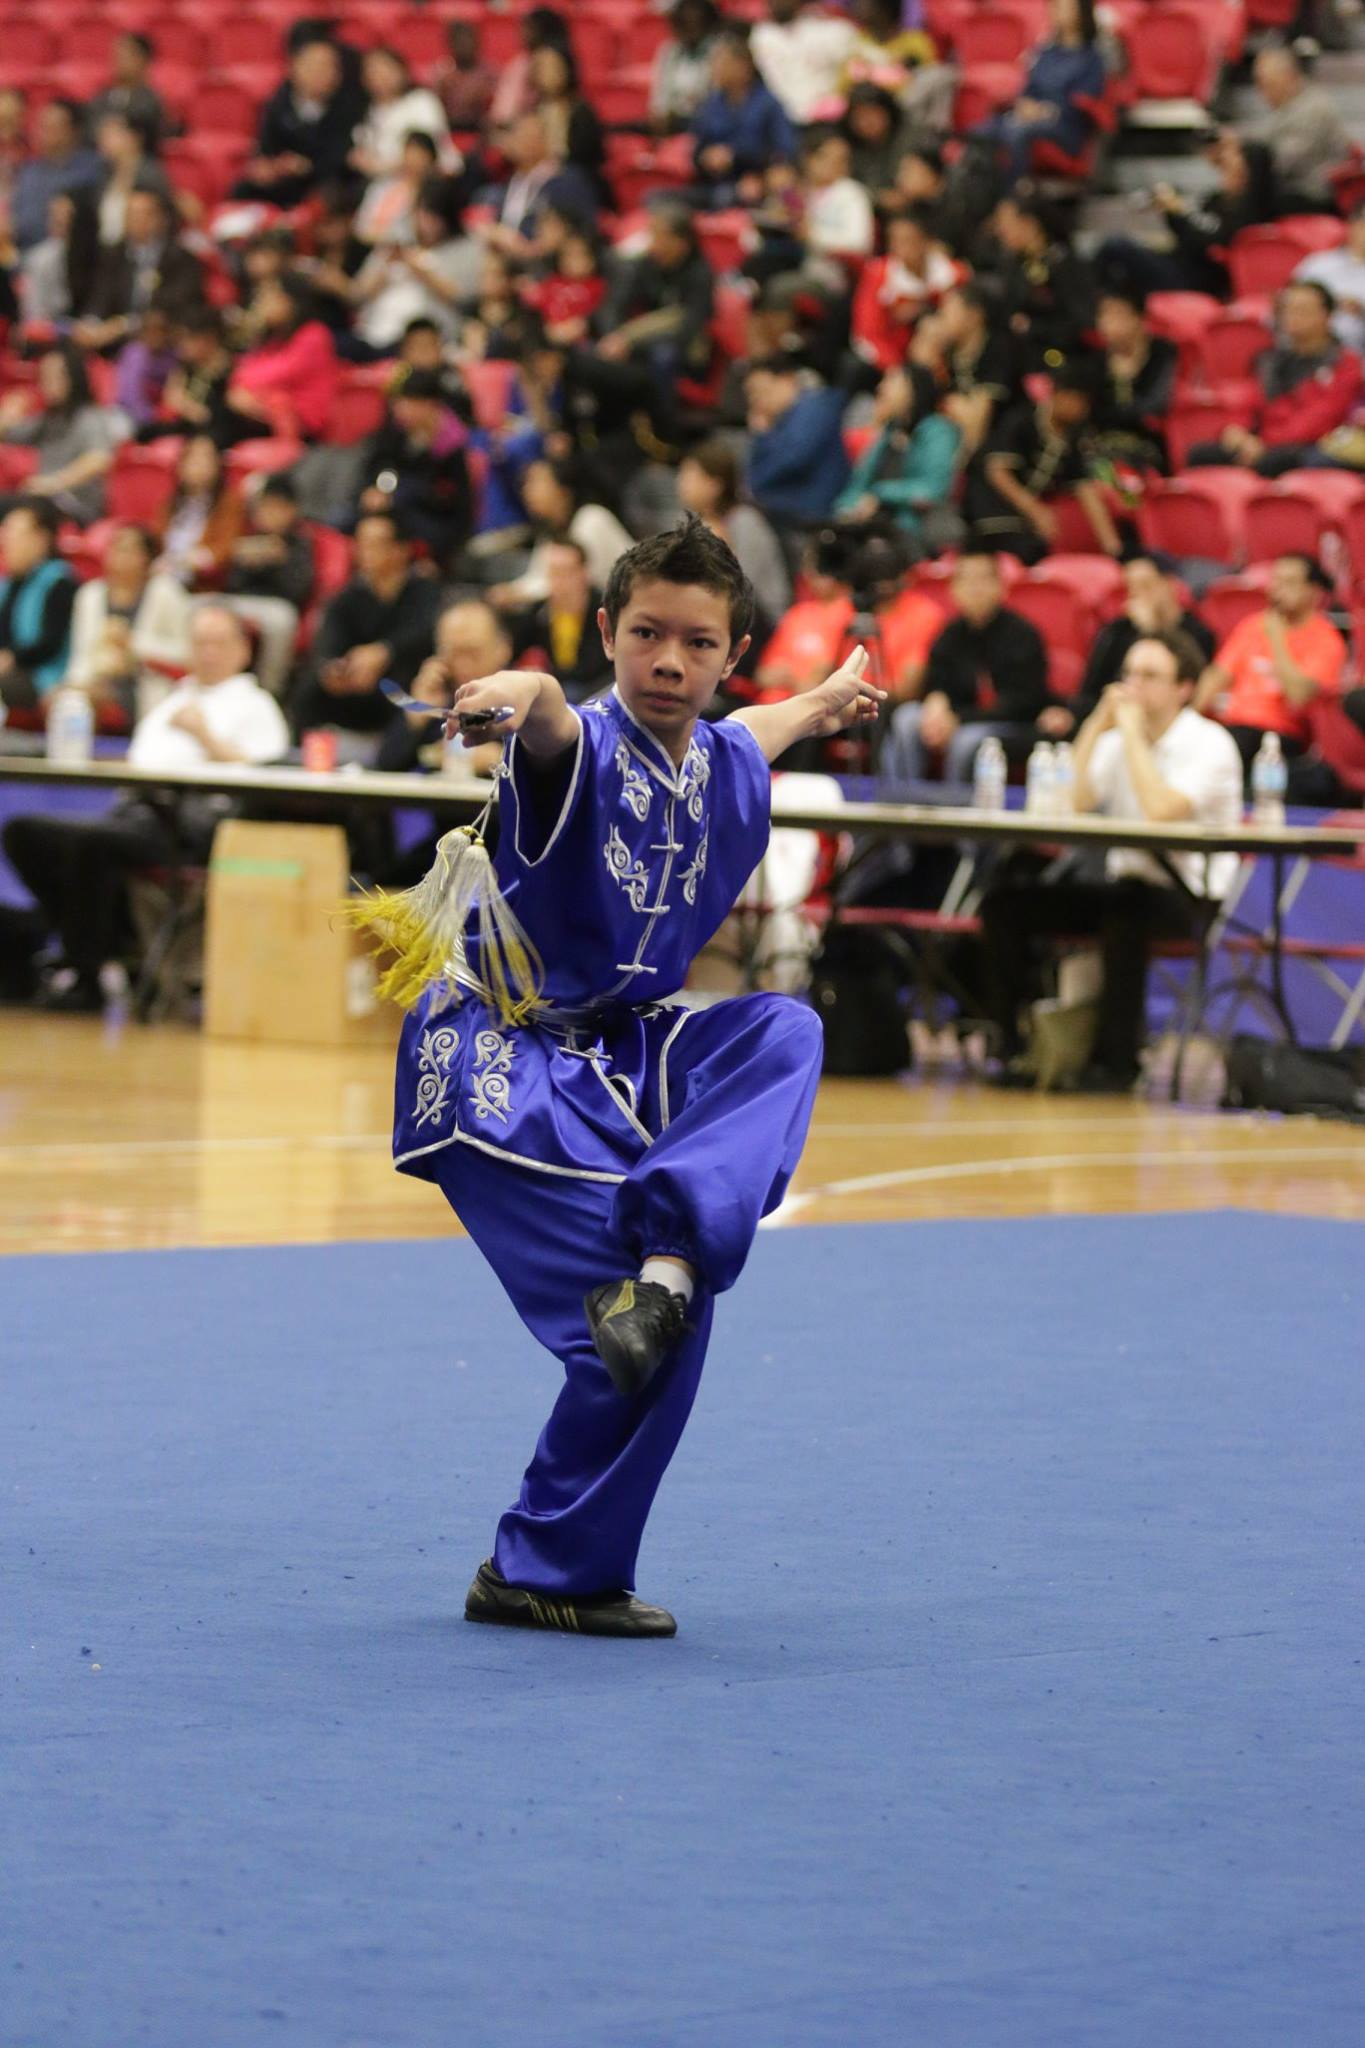 wayland-li-wushu-toronto-markham-canadian-wushu-championships-2017-jianshu-18.jpg